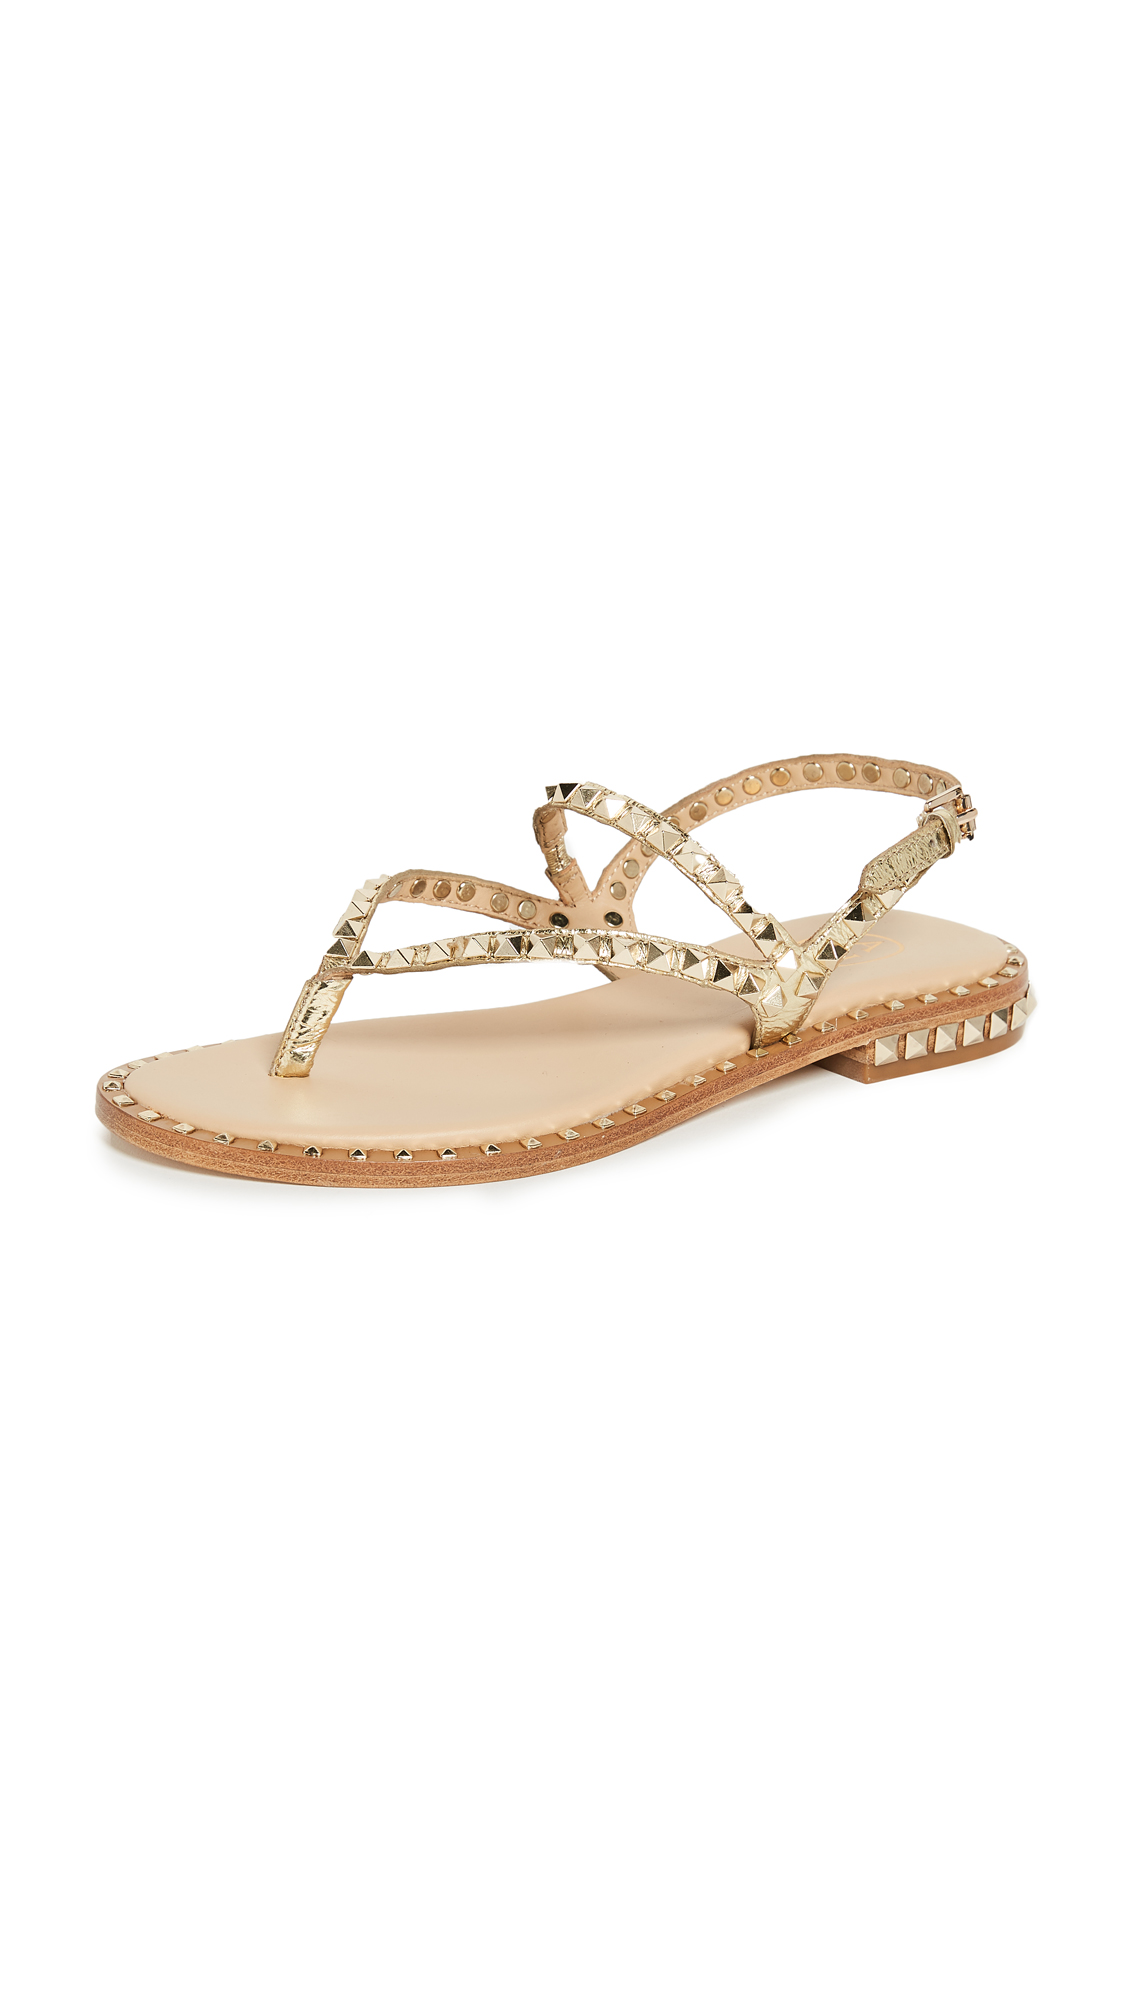 Ash Peps Thong Sandals - Ariel